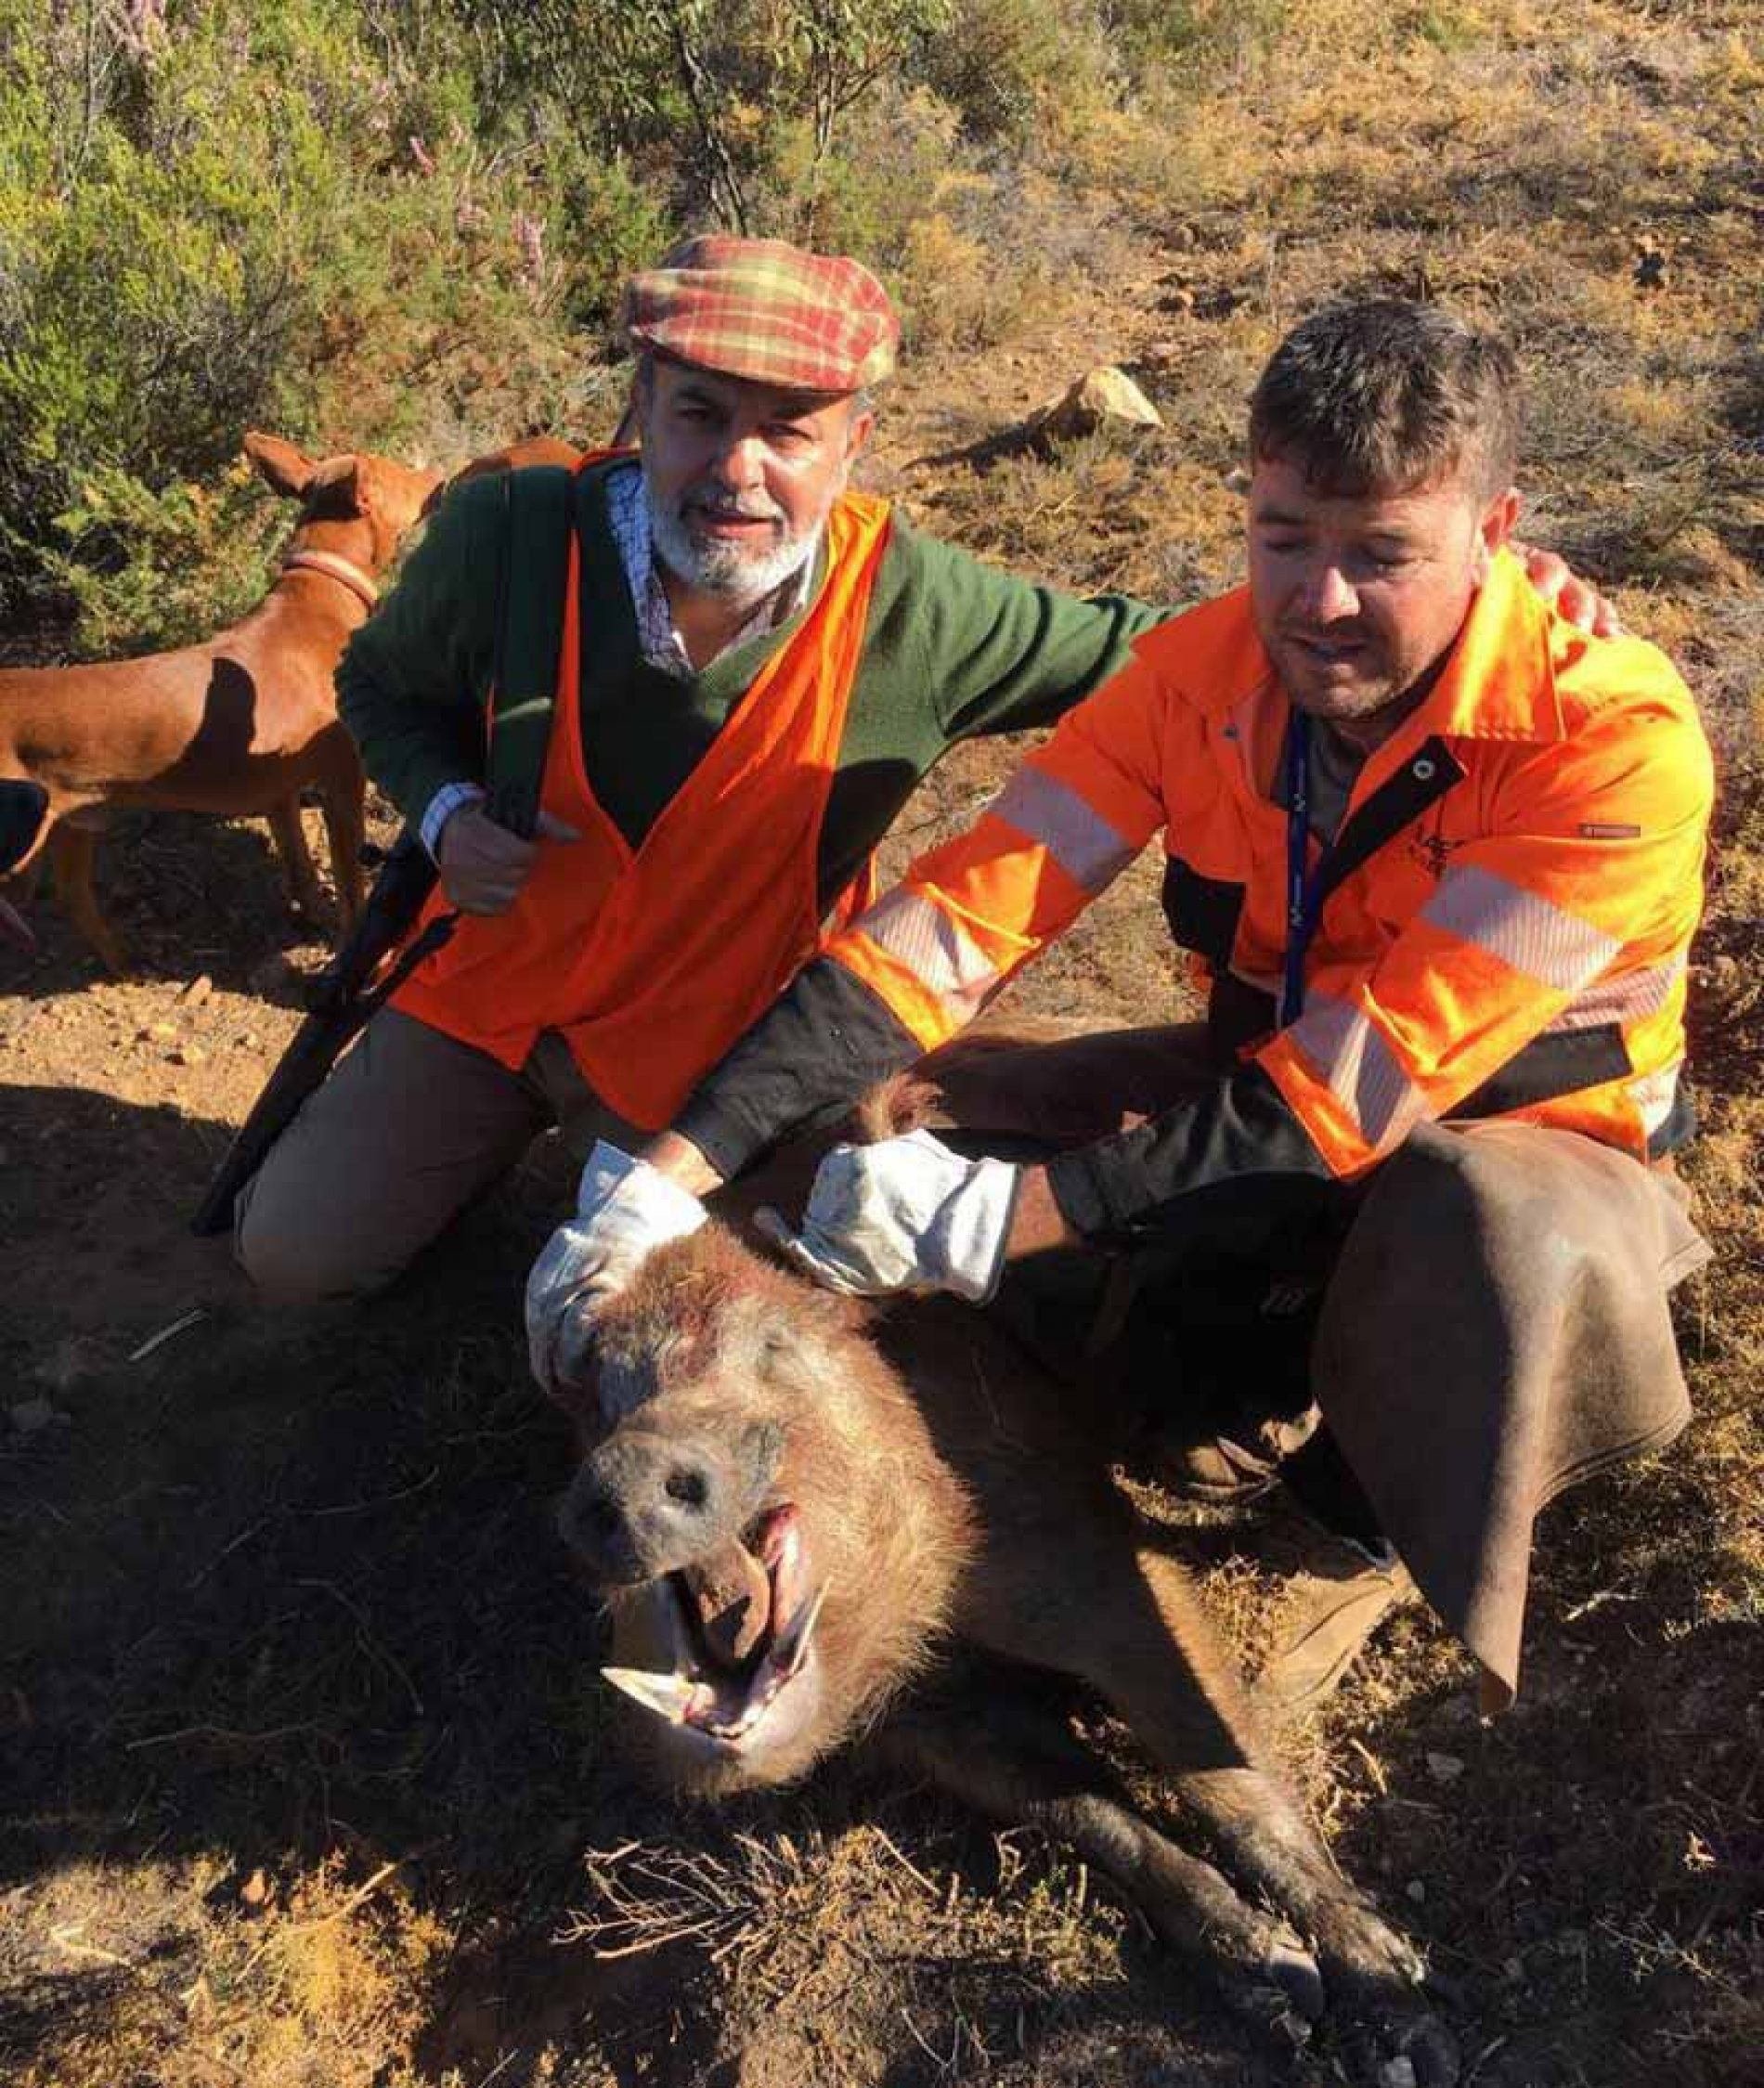 En Valle Prieto, Buen día de caza, con un buen número de disparos